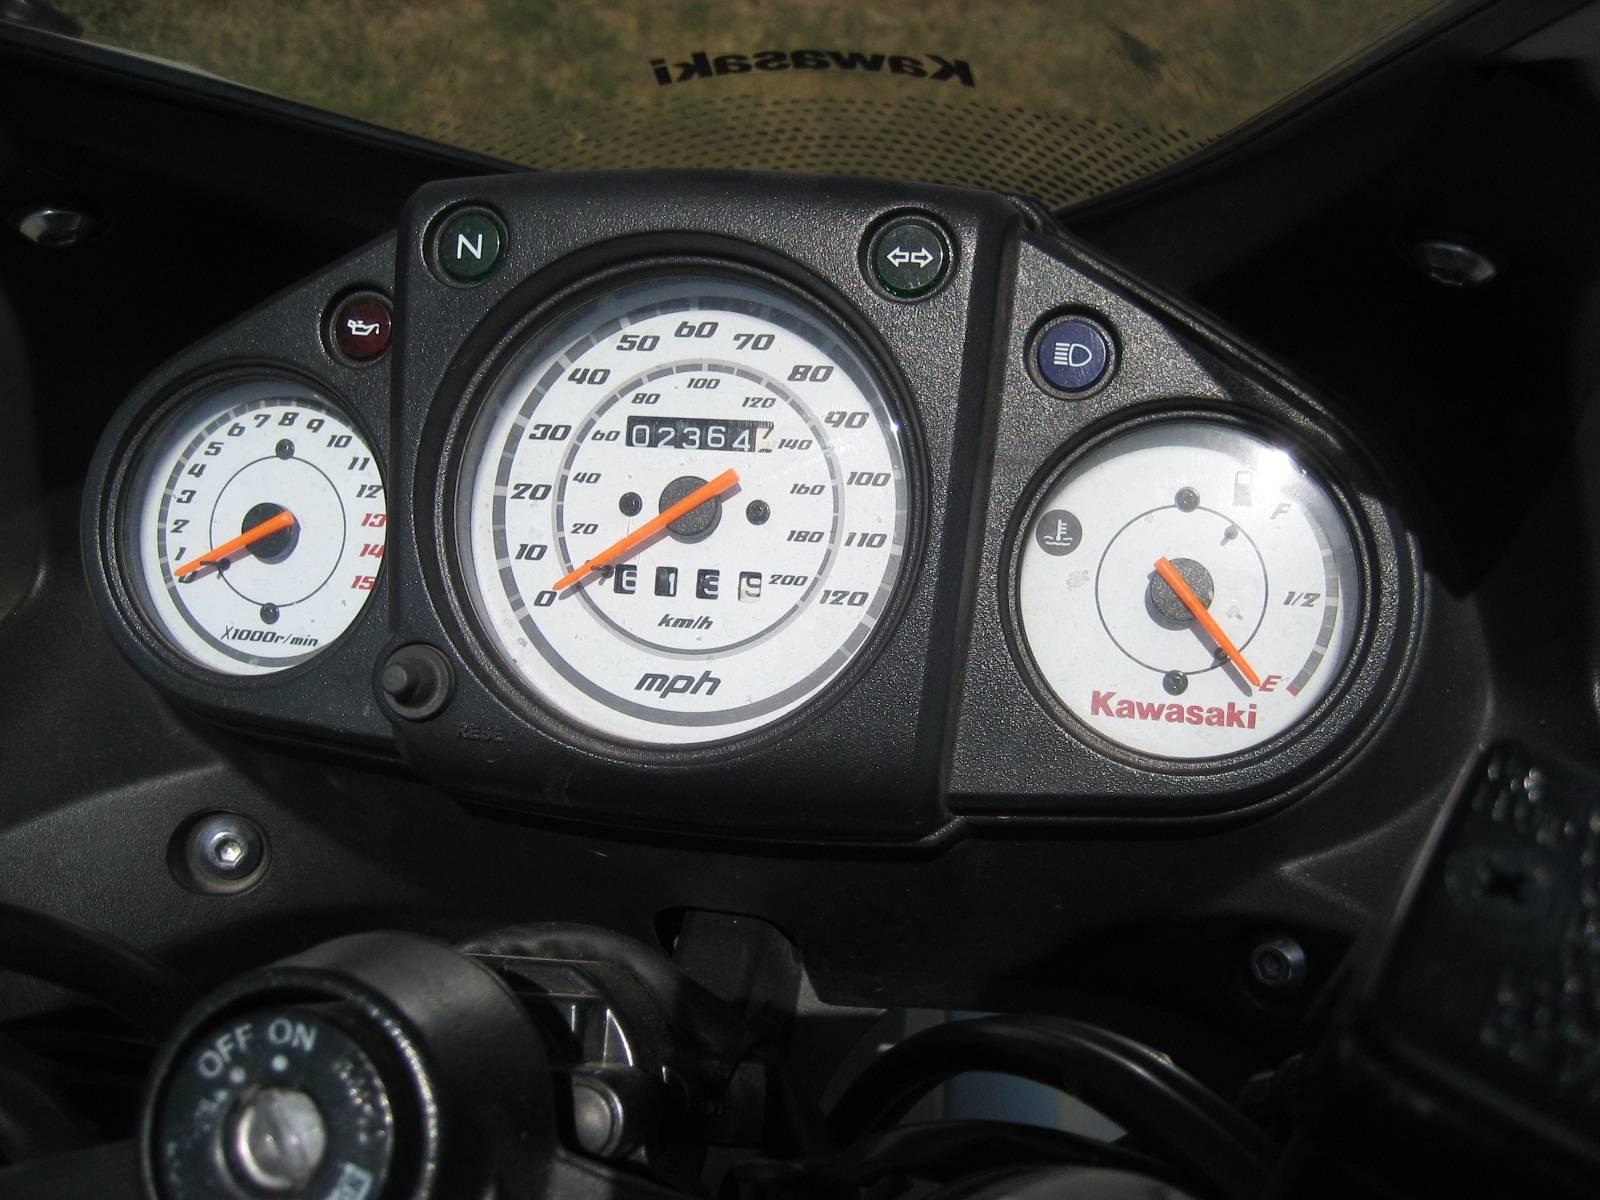 2011 Kawasaki Ninja 250R 3